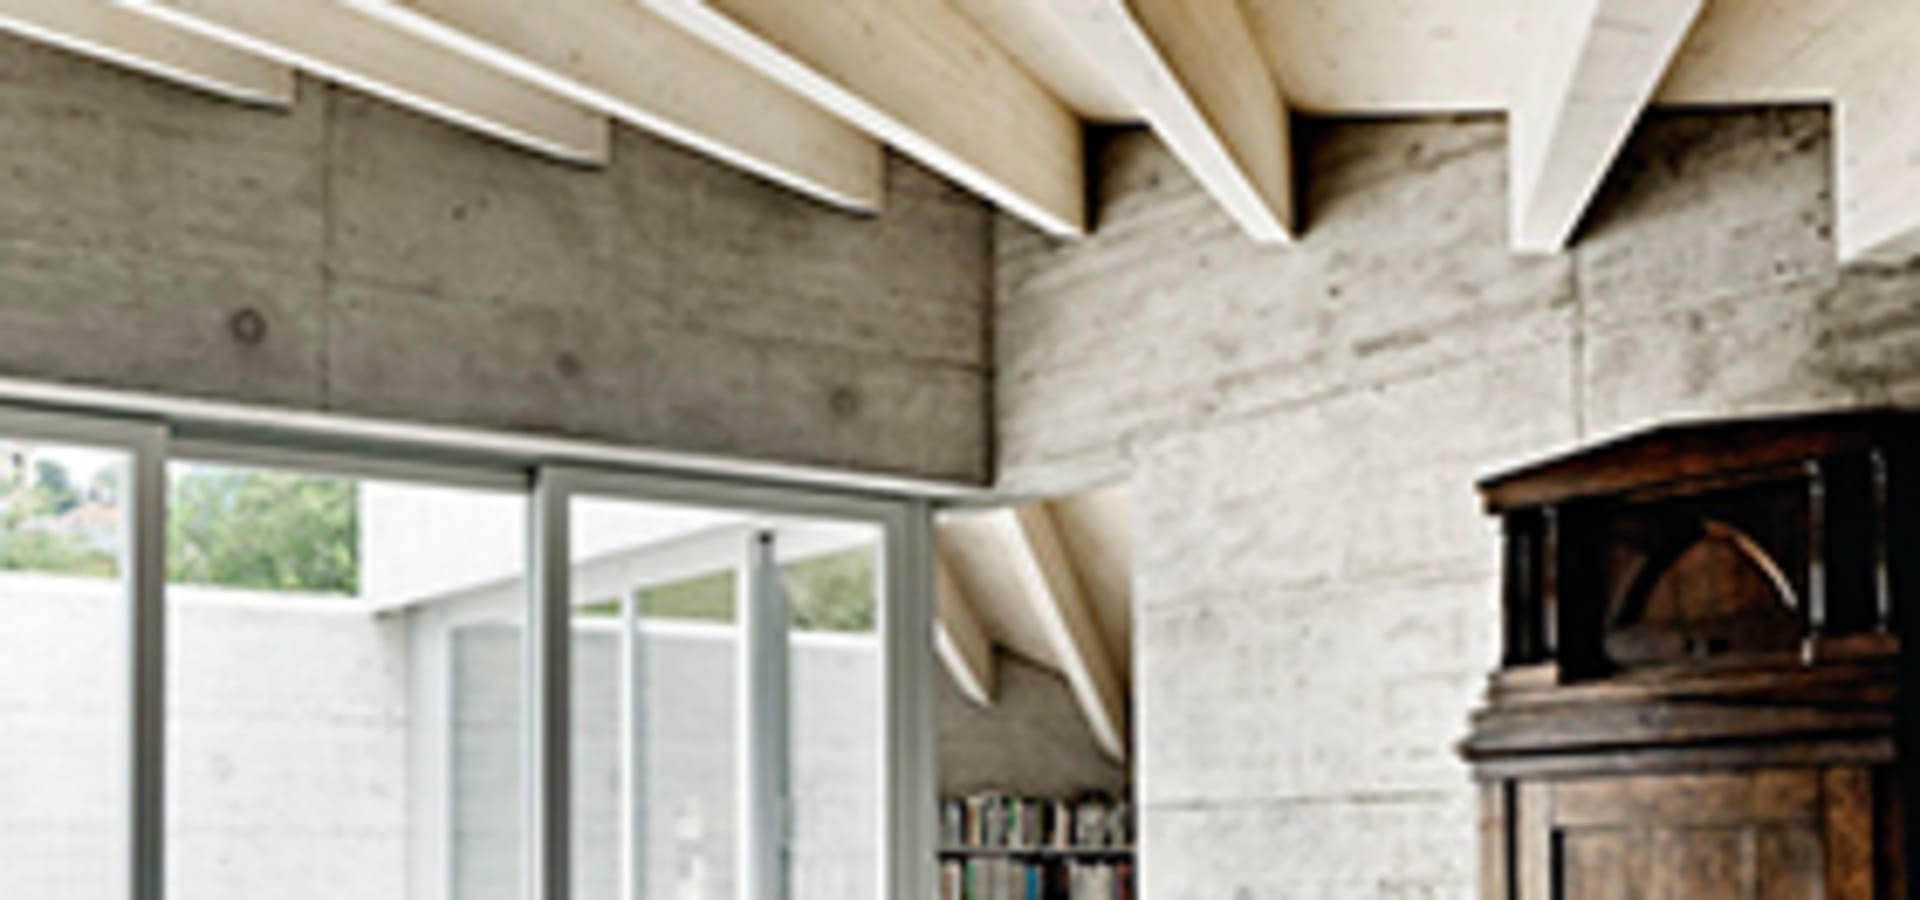 Buzzi studio d'architettura